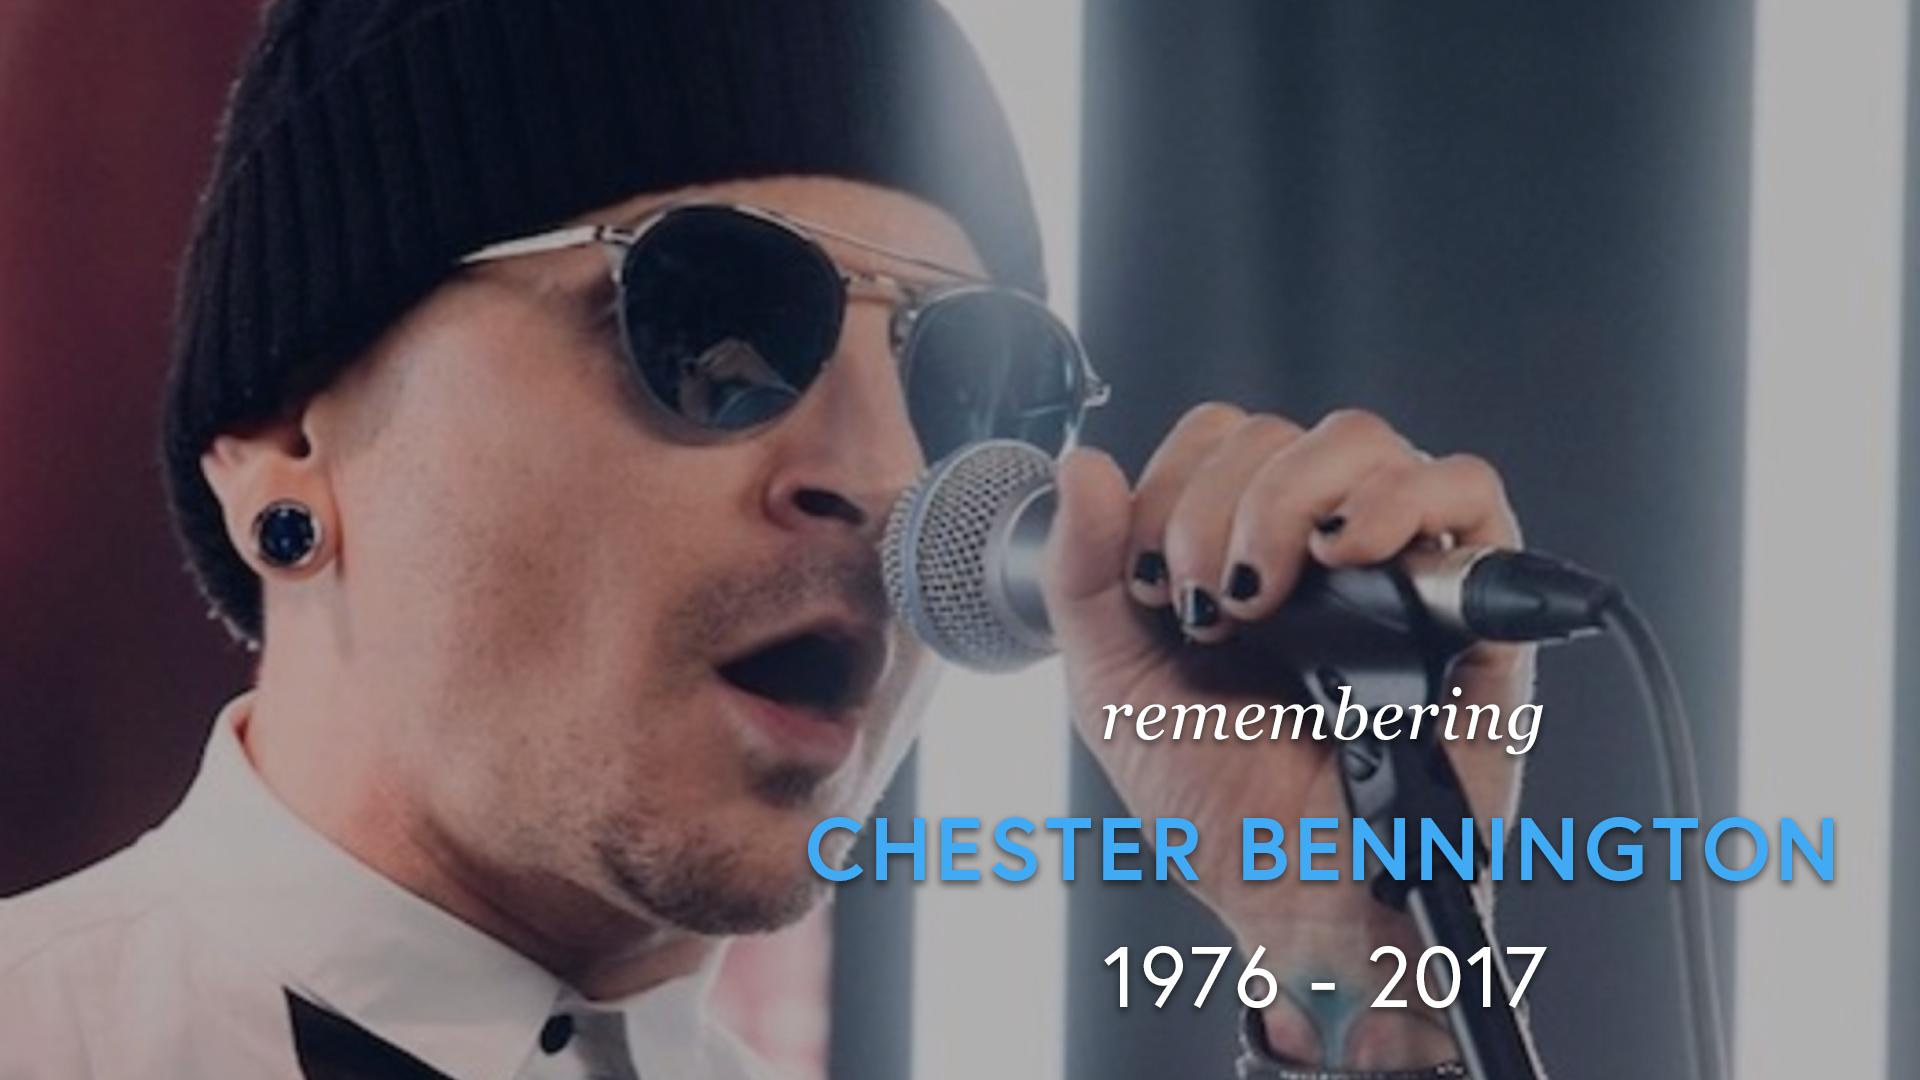 Remembering Chester Bennington screen capture